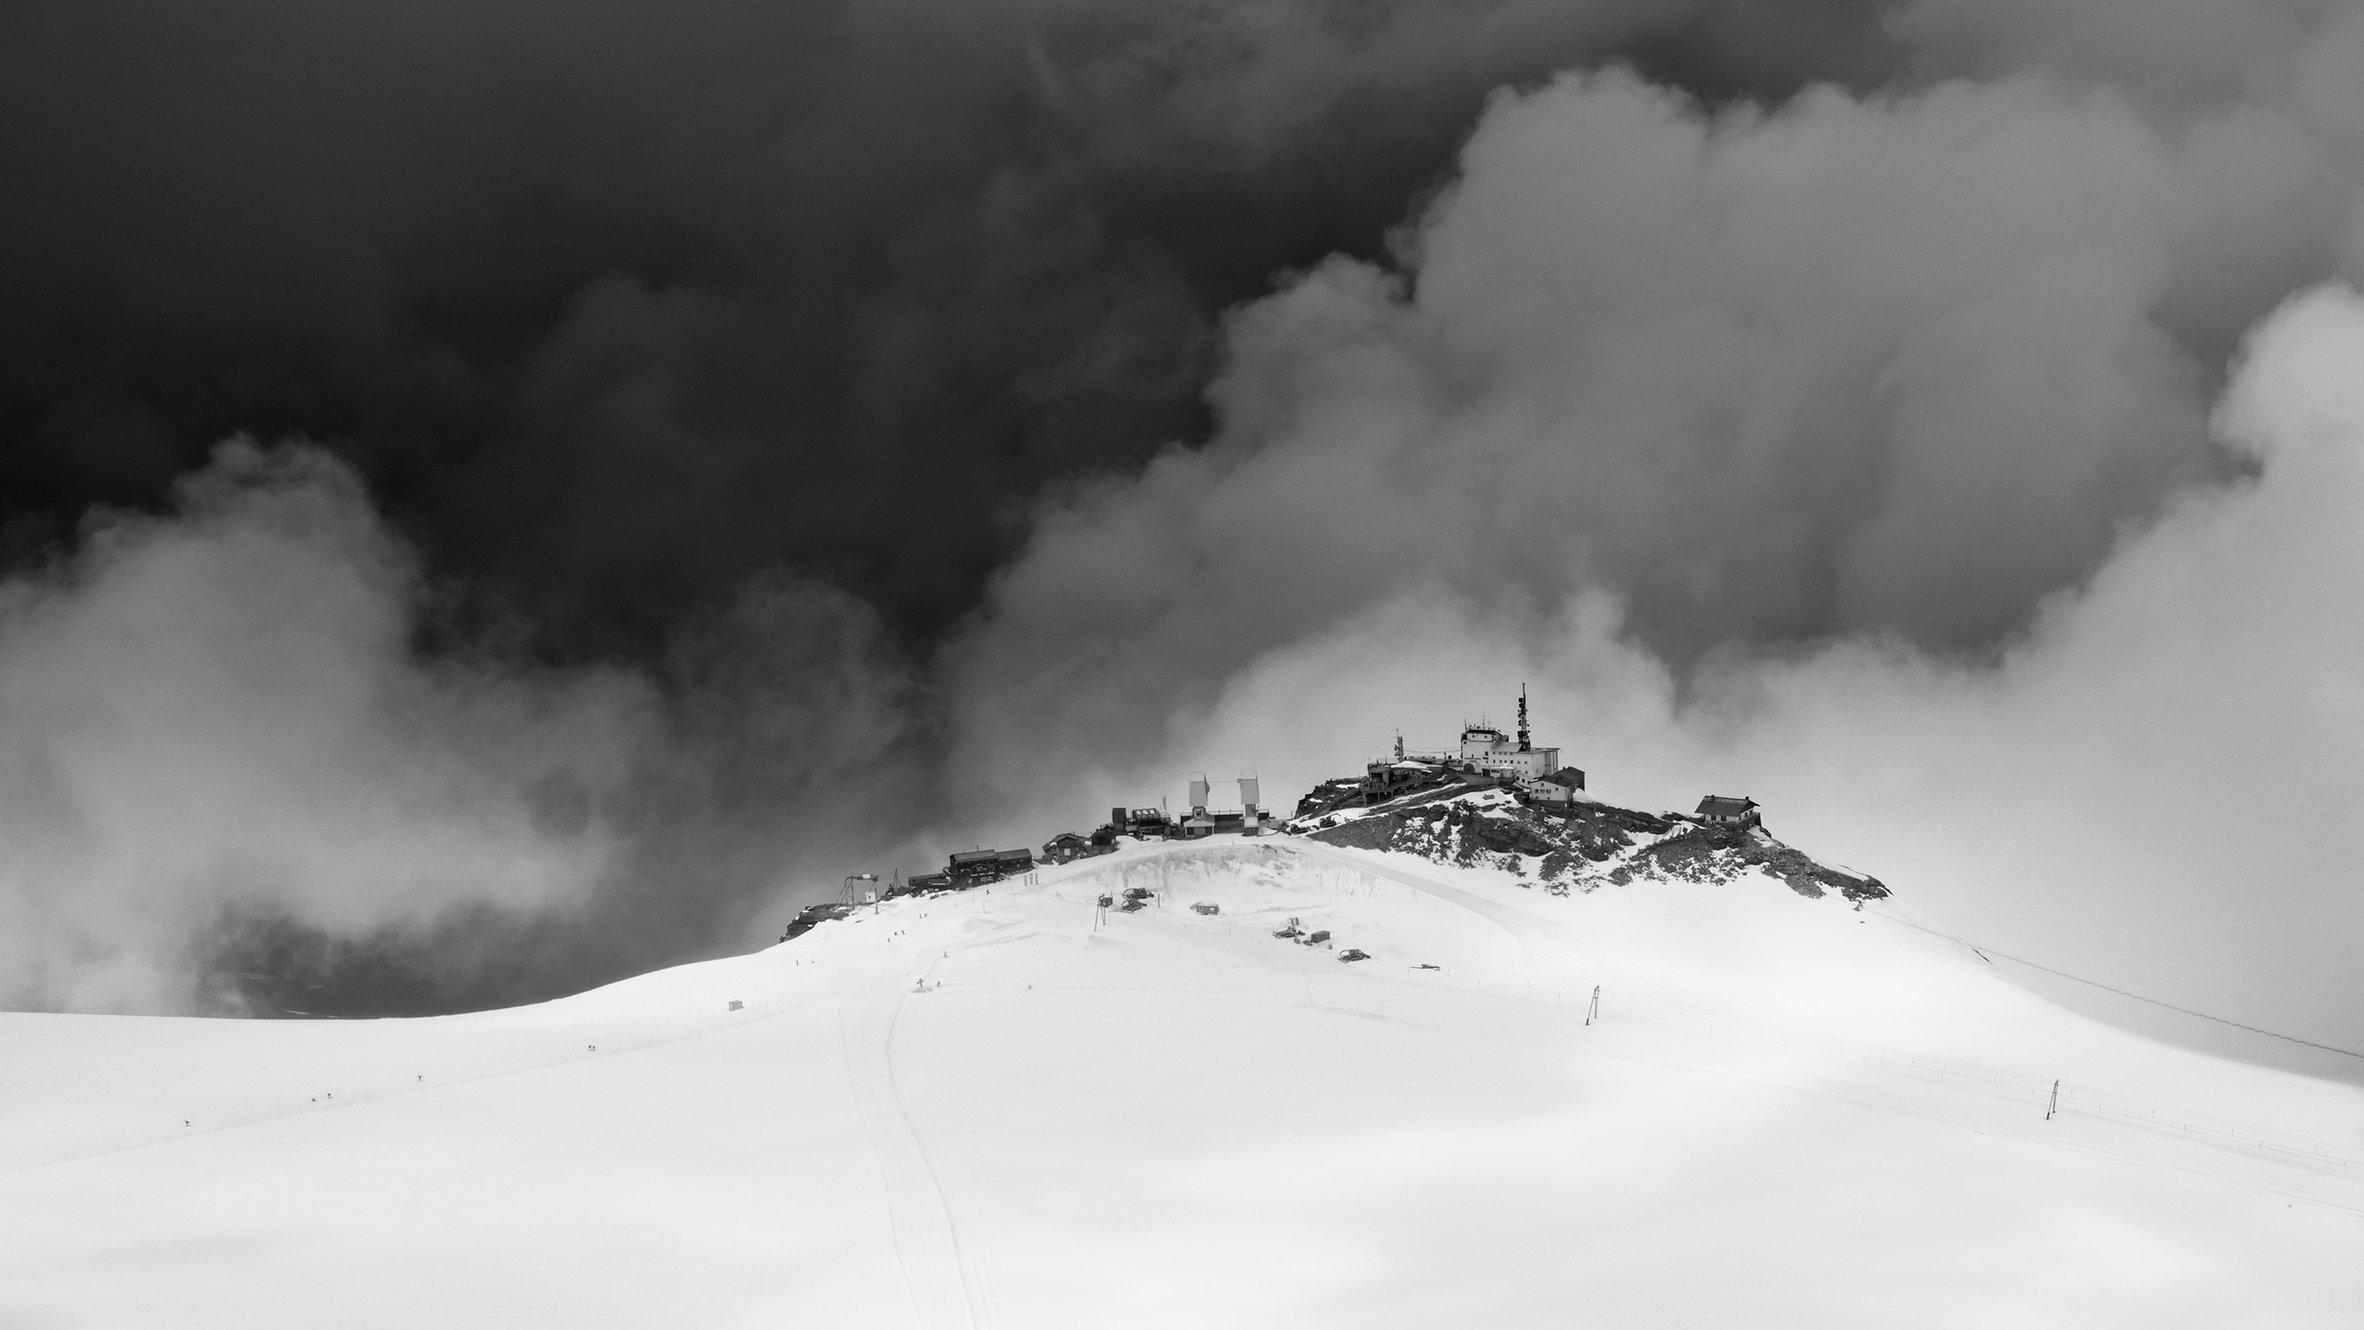 Klien Matterhorn, Switzerland